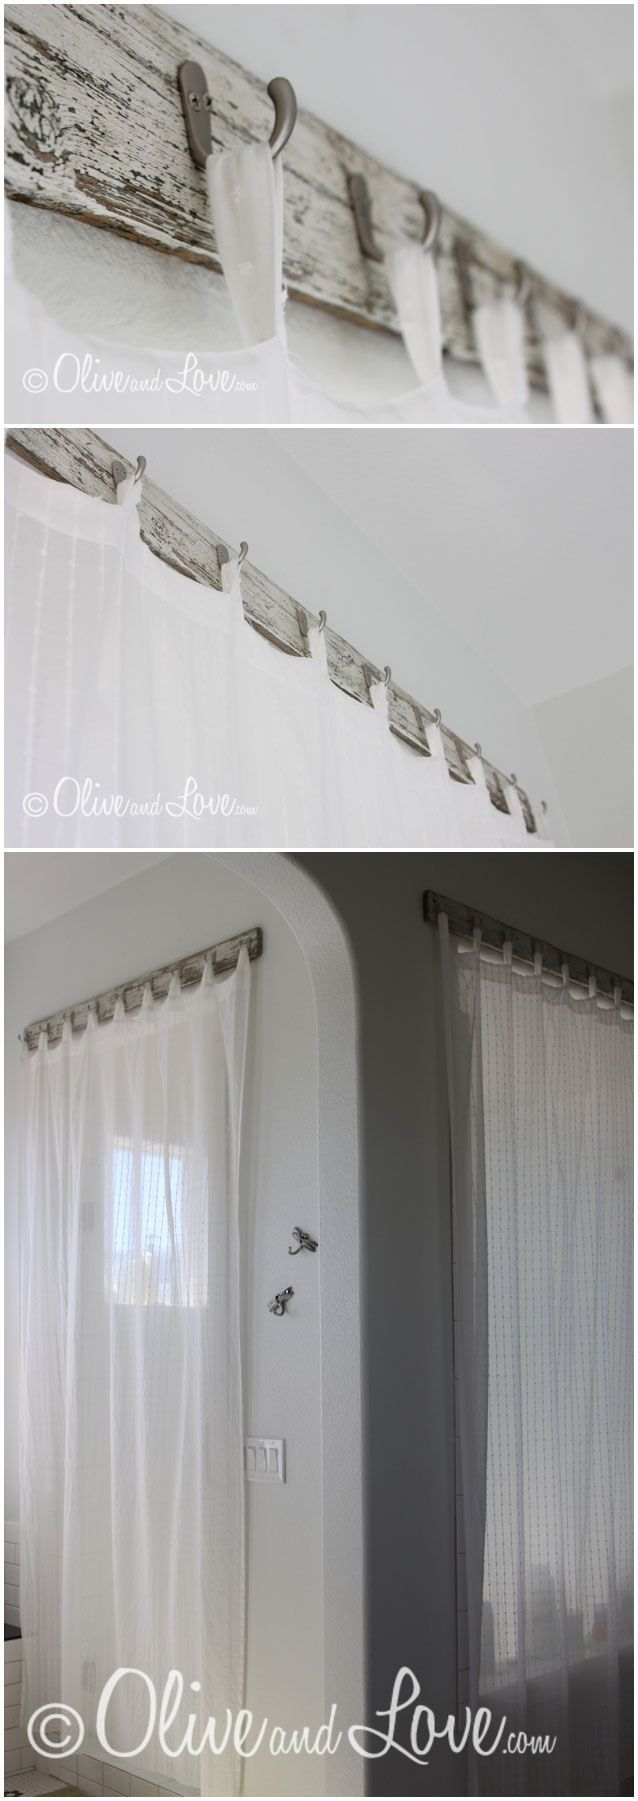 best schöne träumeräume images on pinterest bedroom ideas